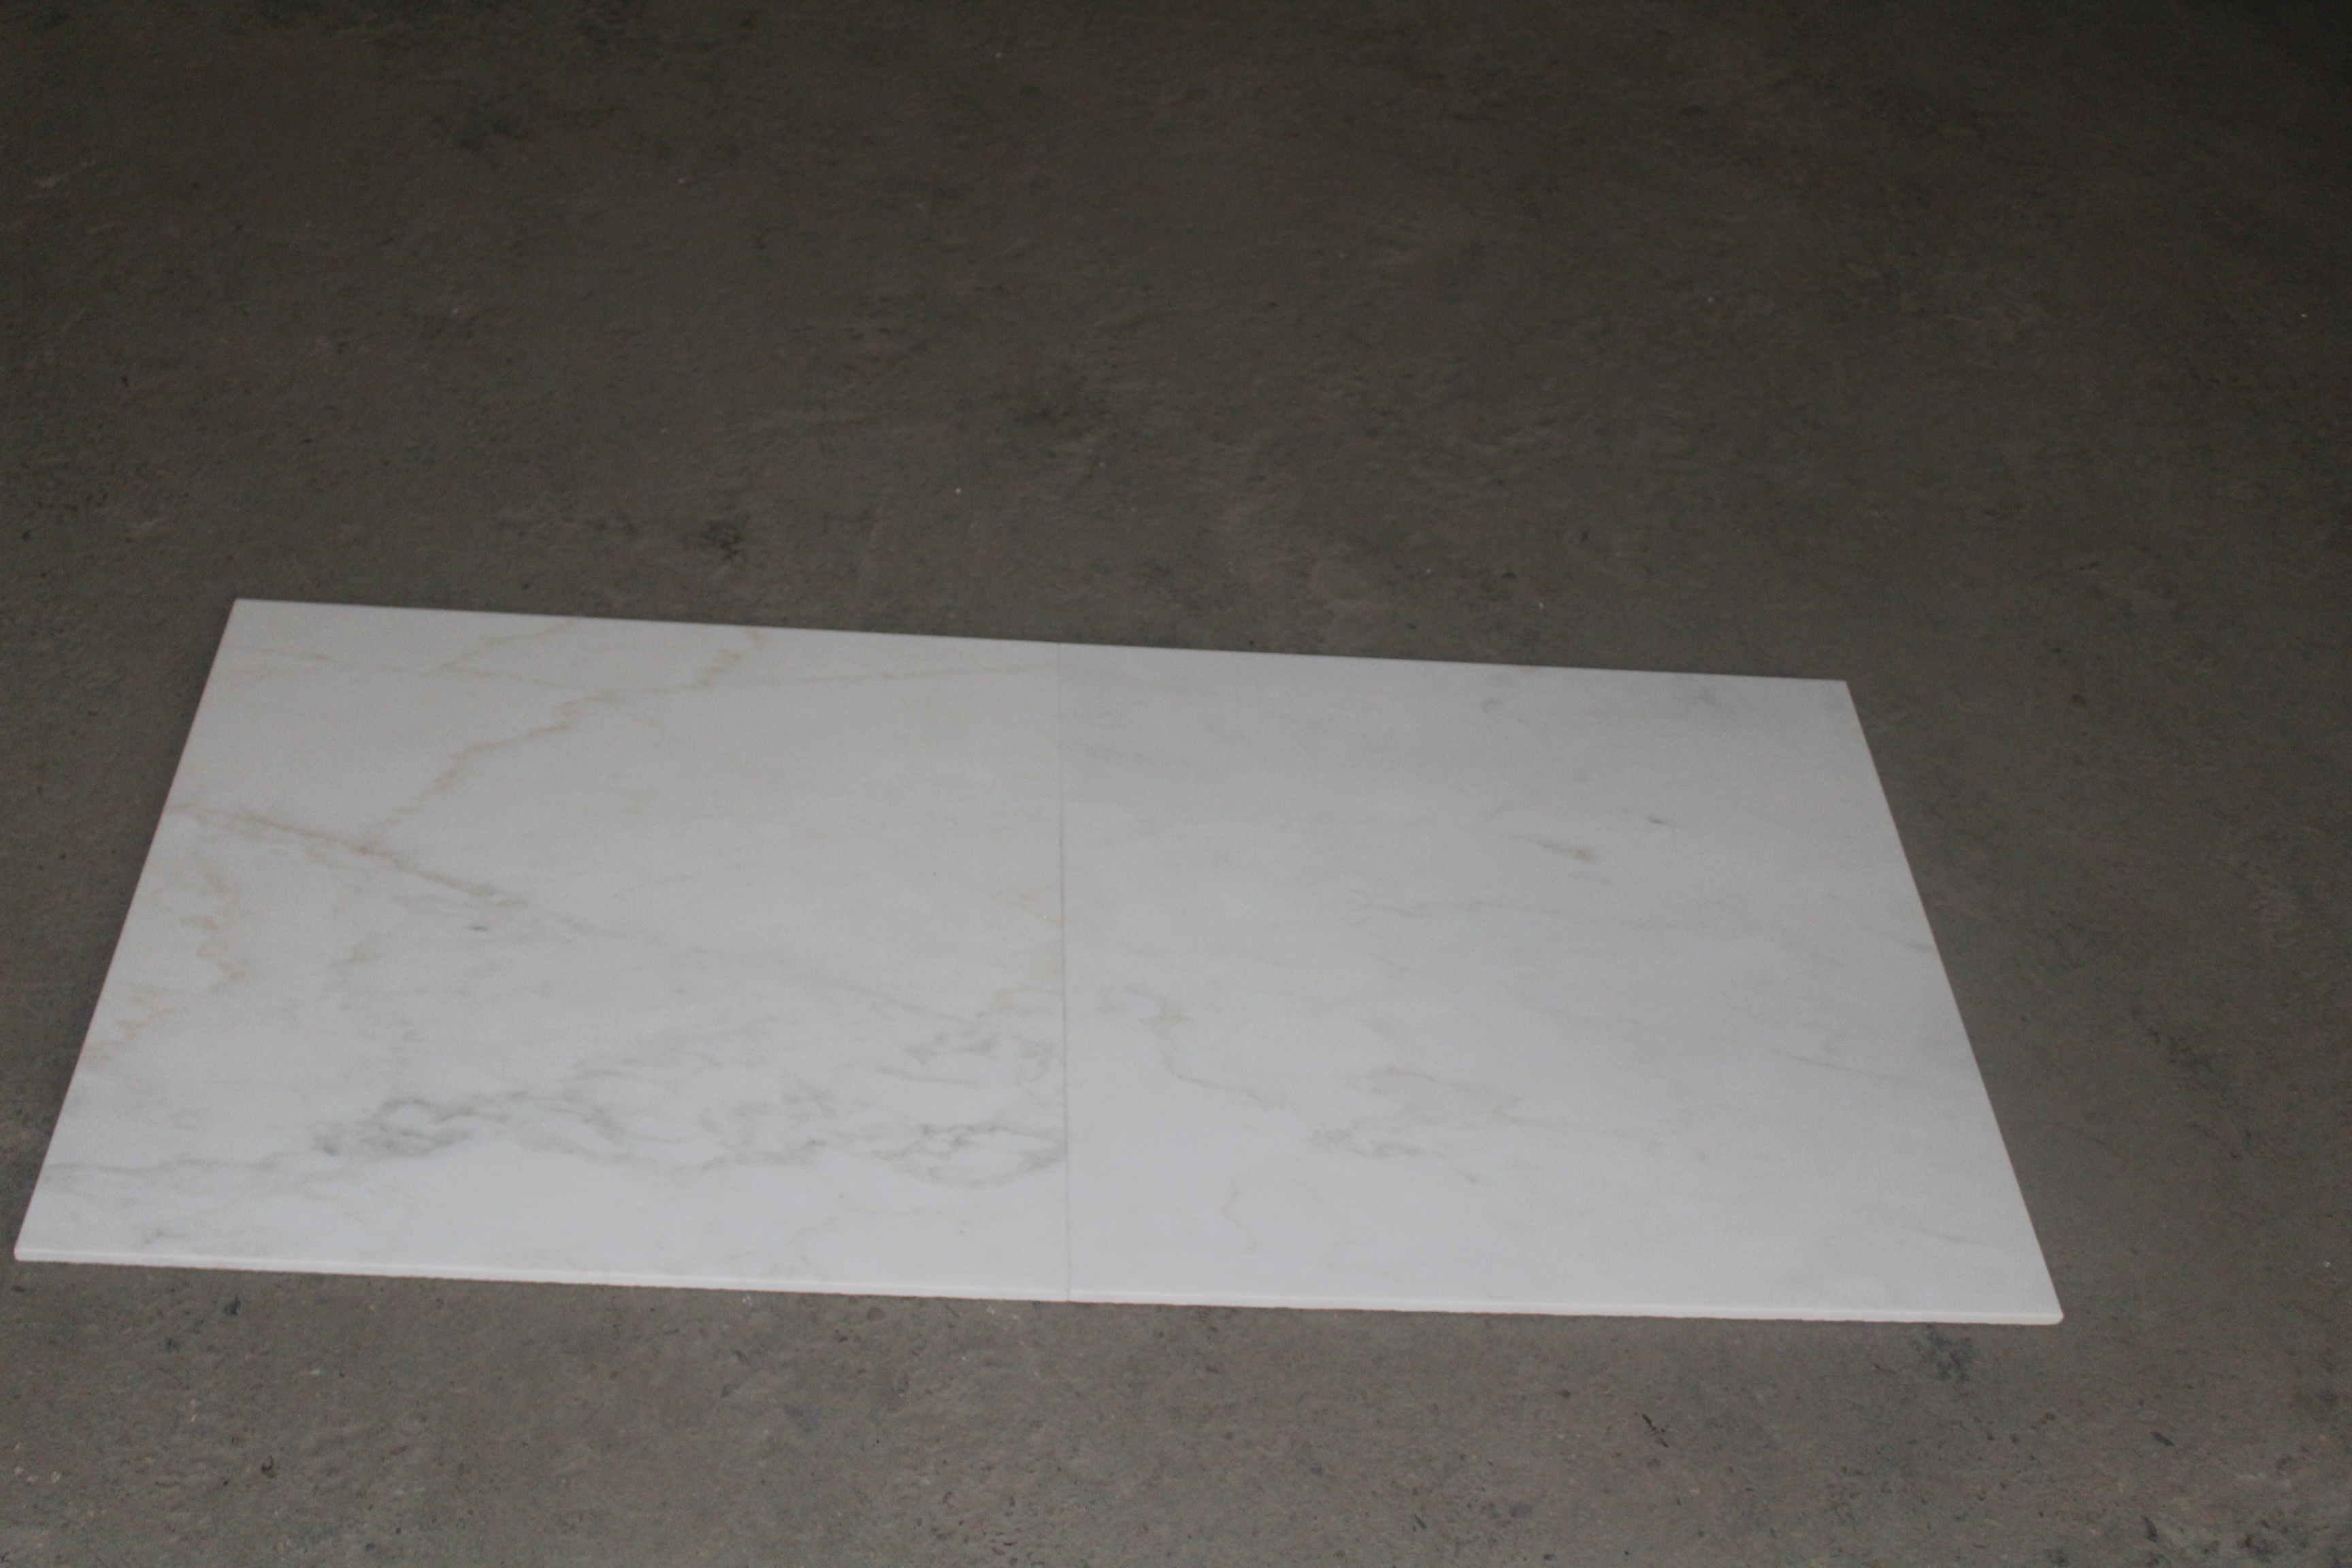 Calacatta MichelAngelo 12x24 Tile